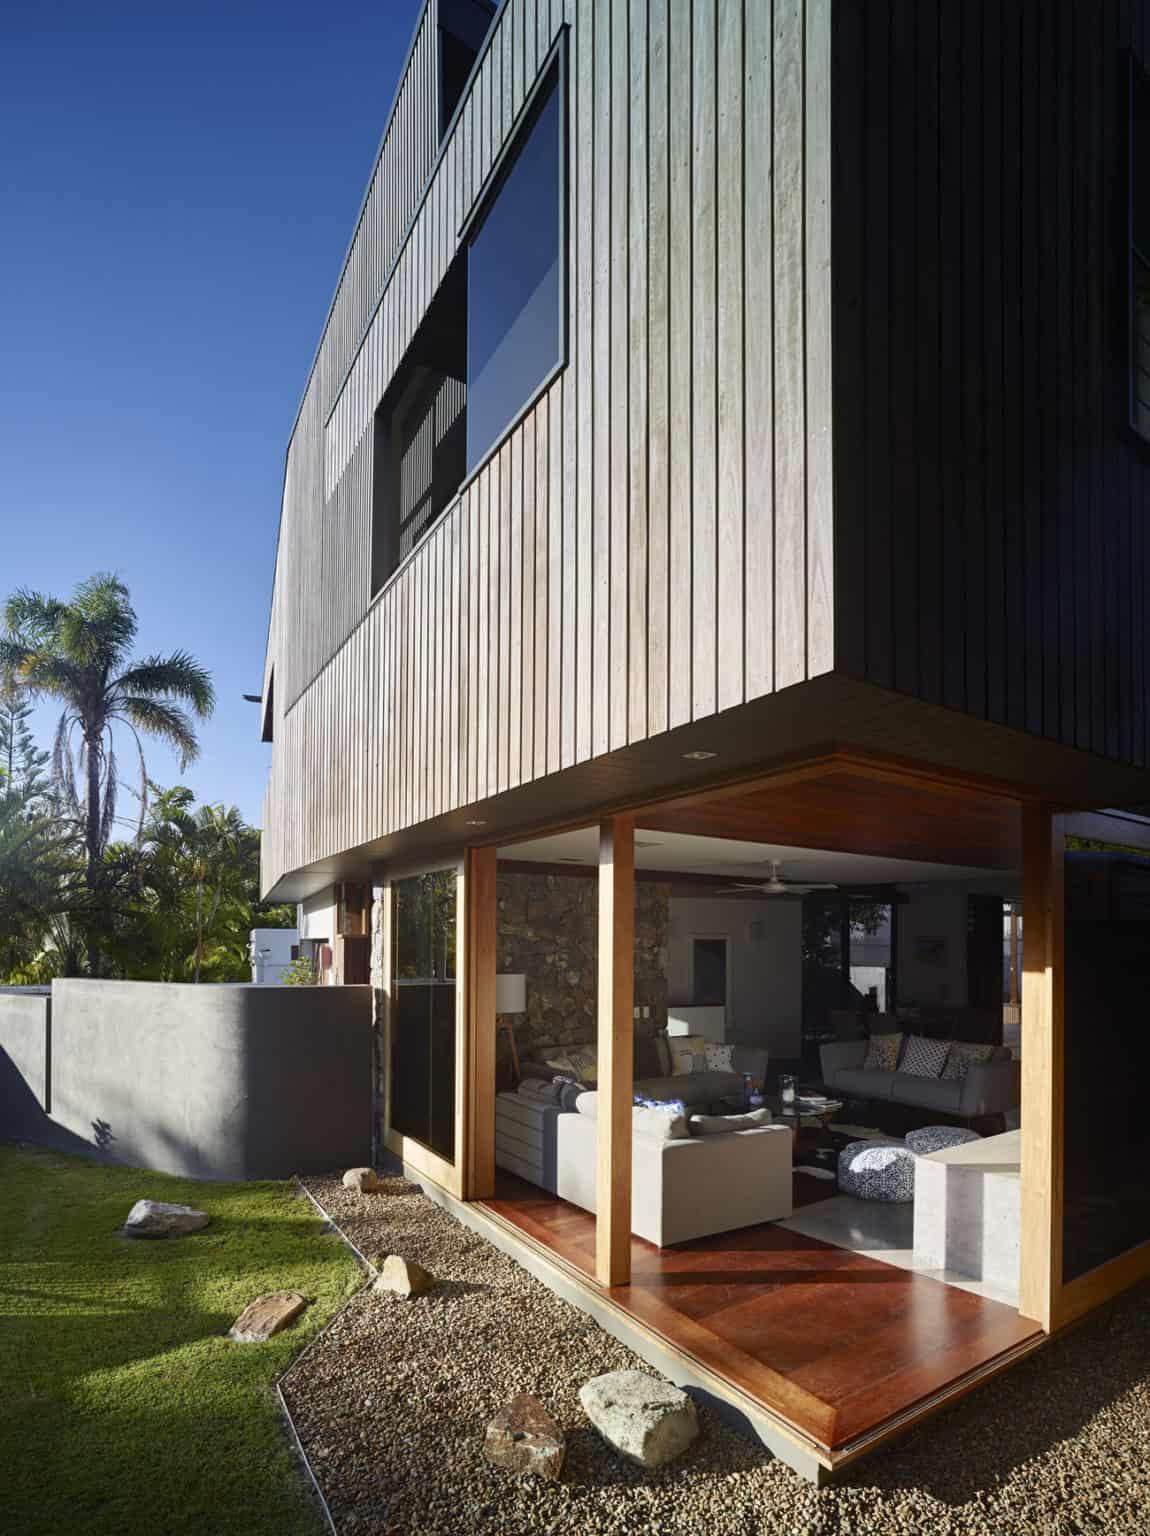 Sunshine Beach House by Shaun Lockyer Architects (3)